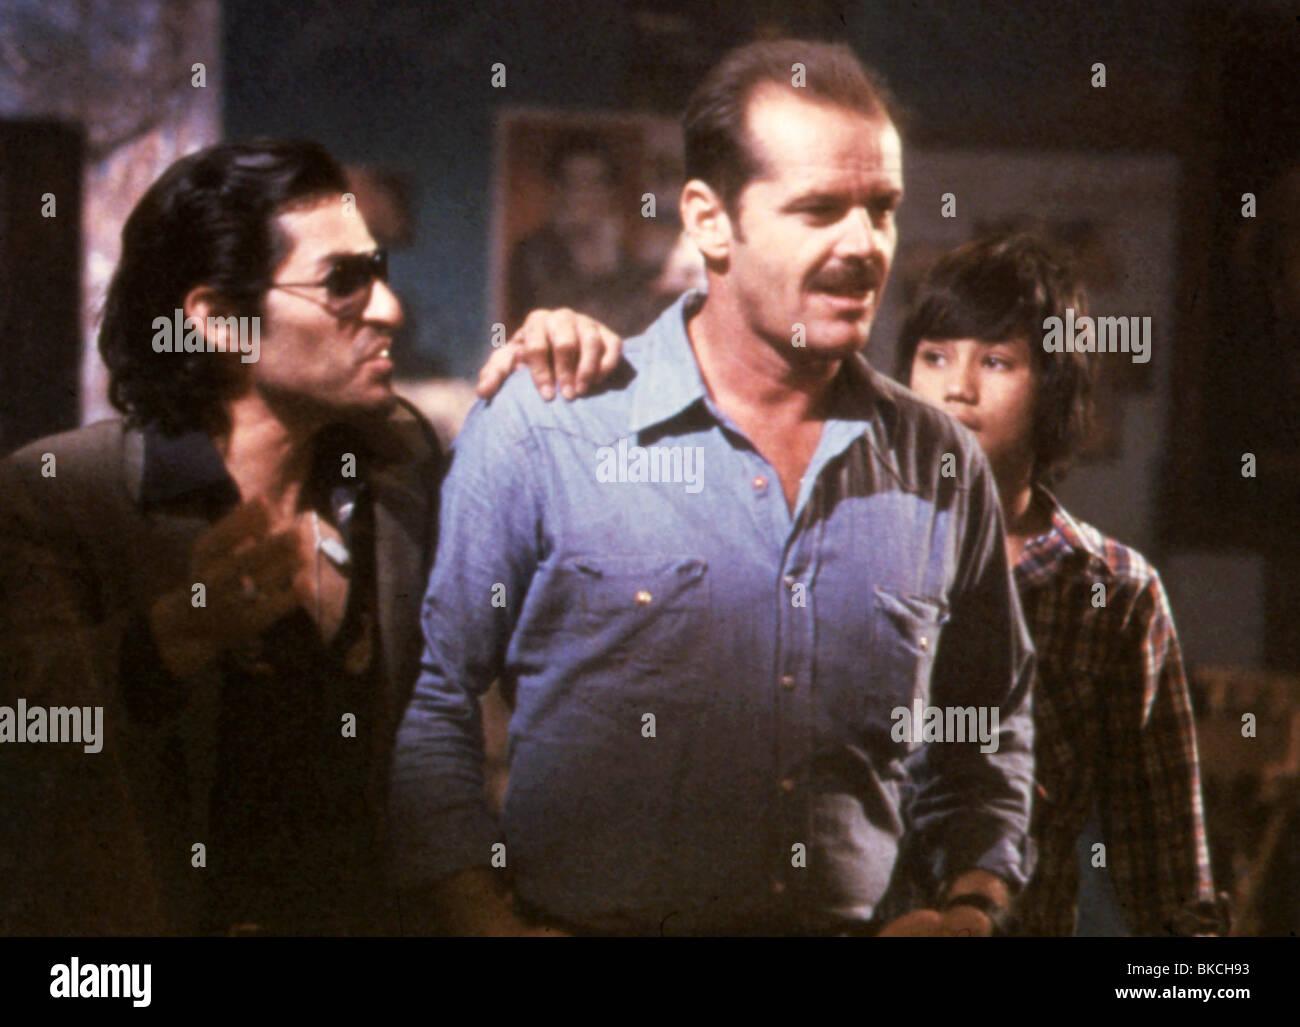 THE BORDER (1981) MIKE GOMEZ, JACK NICHOLSON BOR 012 - Stock Image